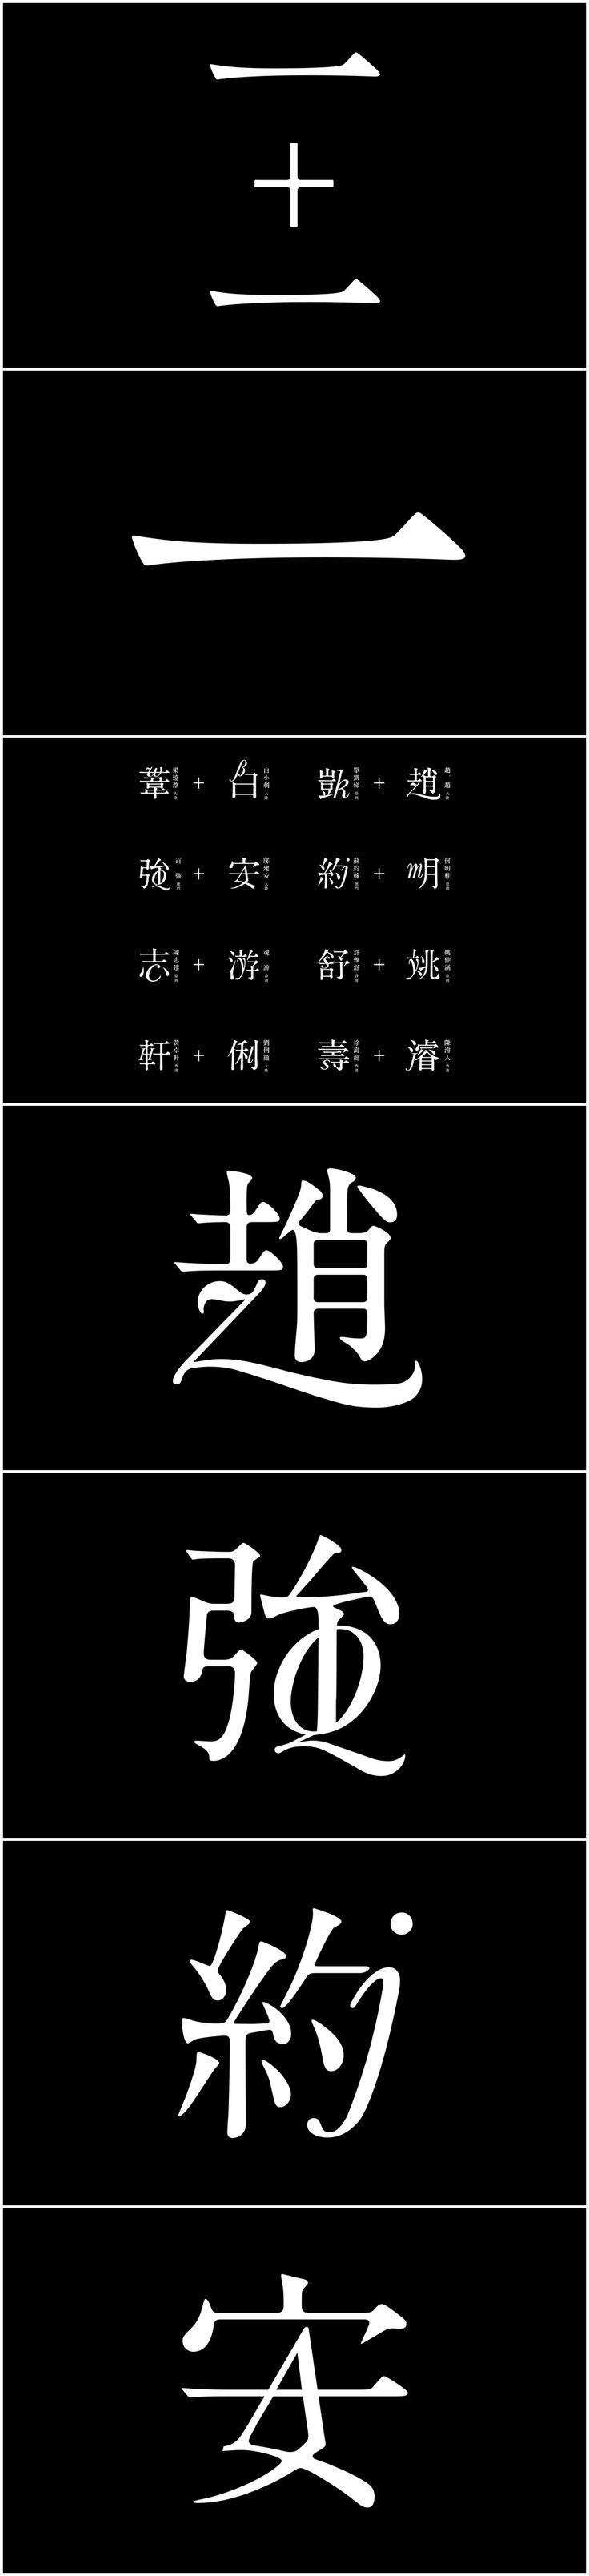 1+1 via http://www.trilingua.hk/projects/visual-identity/oneone/